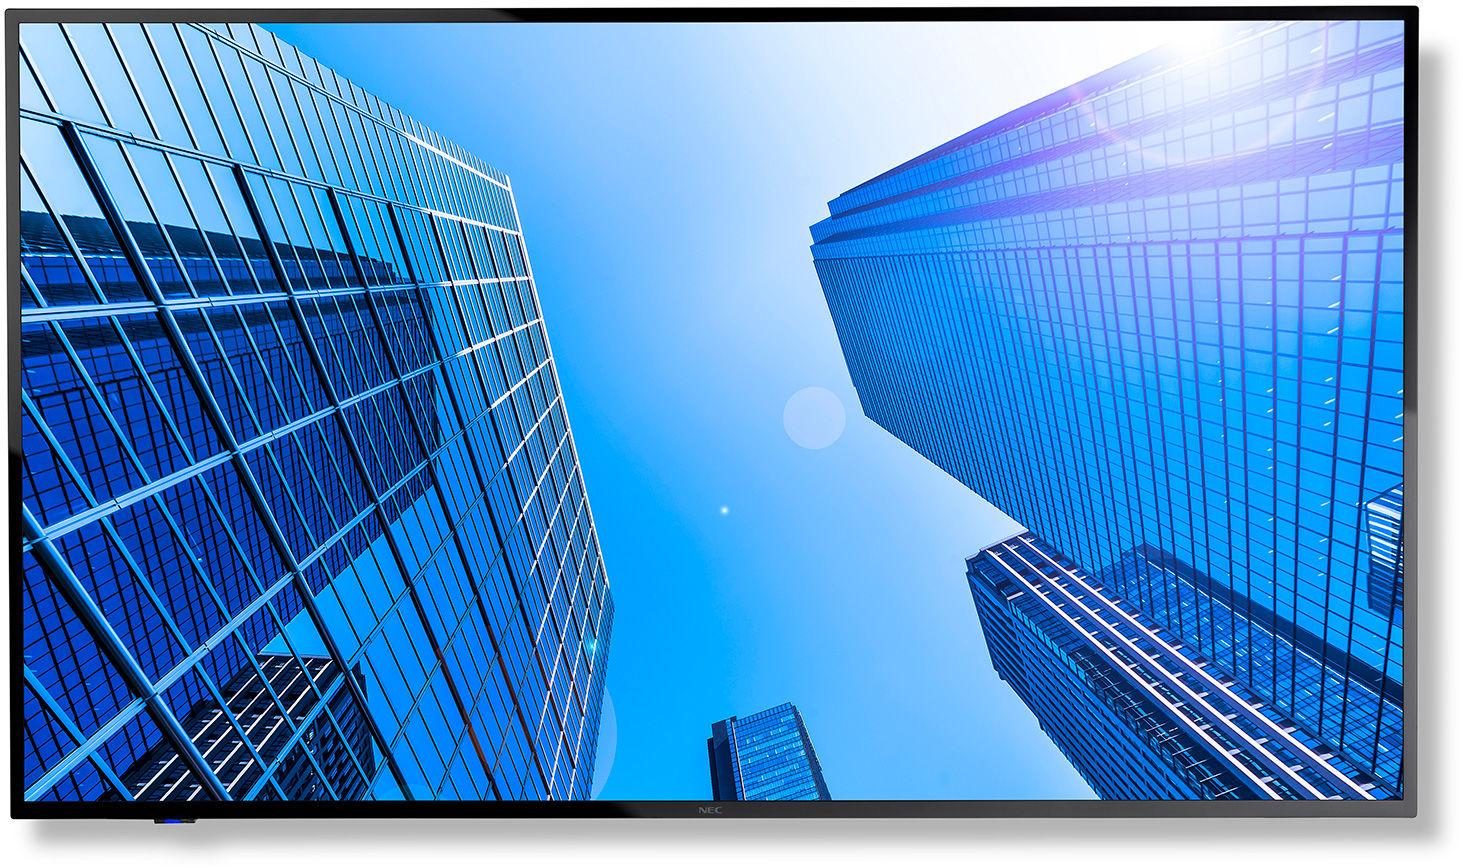 Projektory, ekrany, monitory interaktywne - Profesjonalne doradztwo - Kontakt: 71 784 97 60. Sklep Projektor.pl